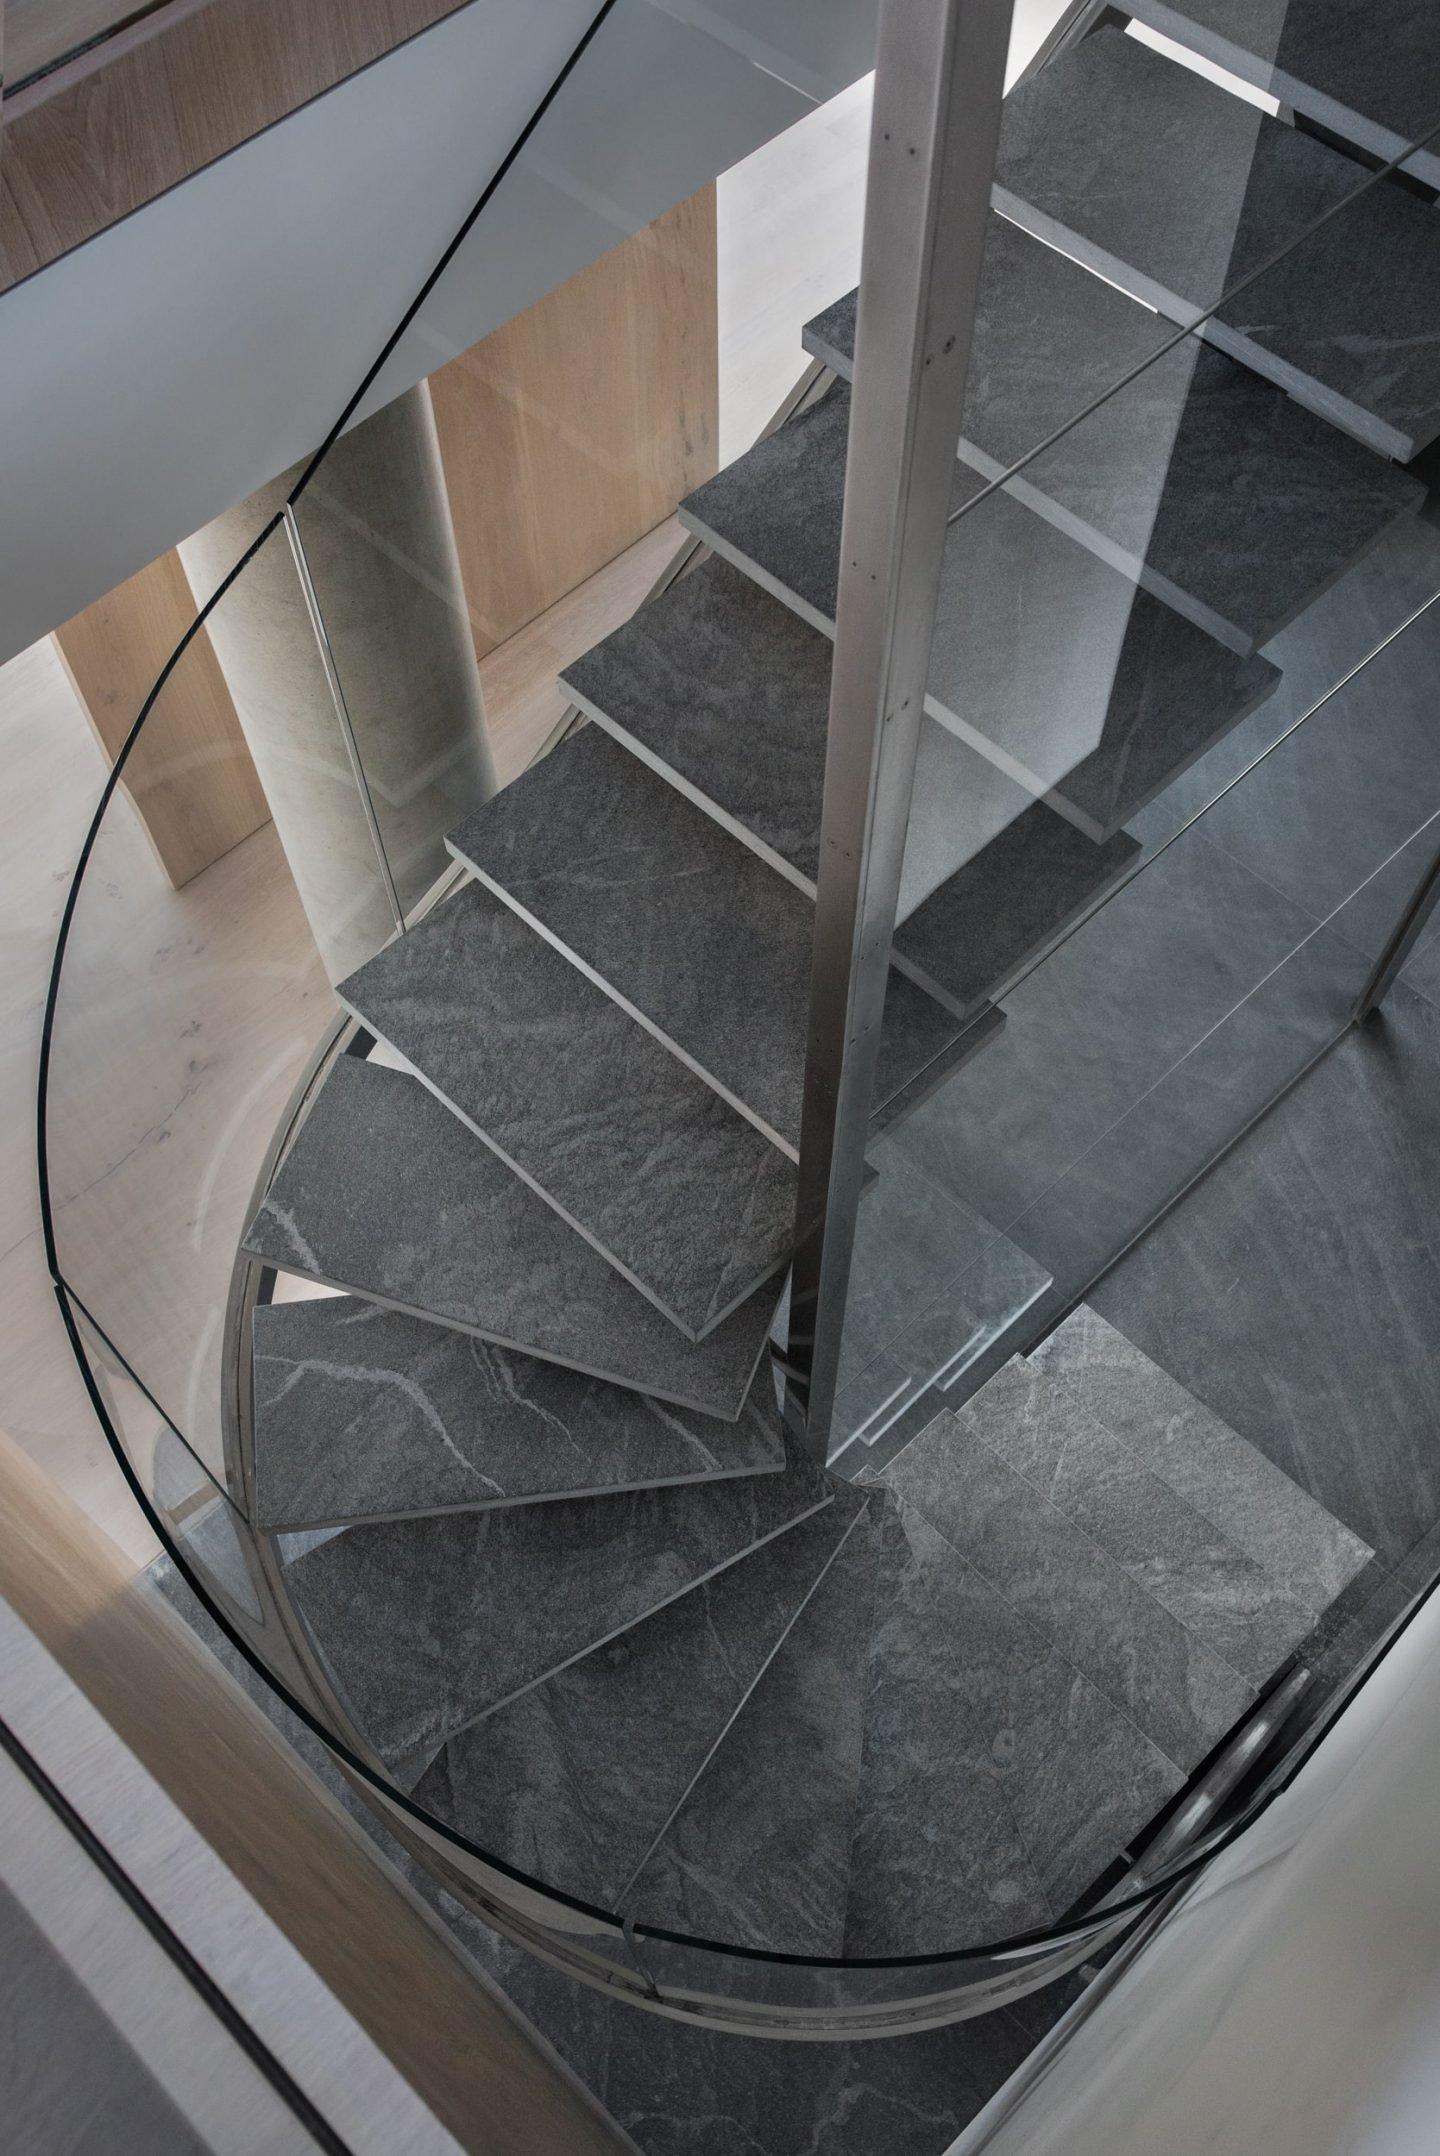 IGNANT-Architecture-Tadao-Ando-Penthouse-Eric-Petschek-03